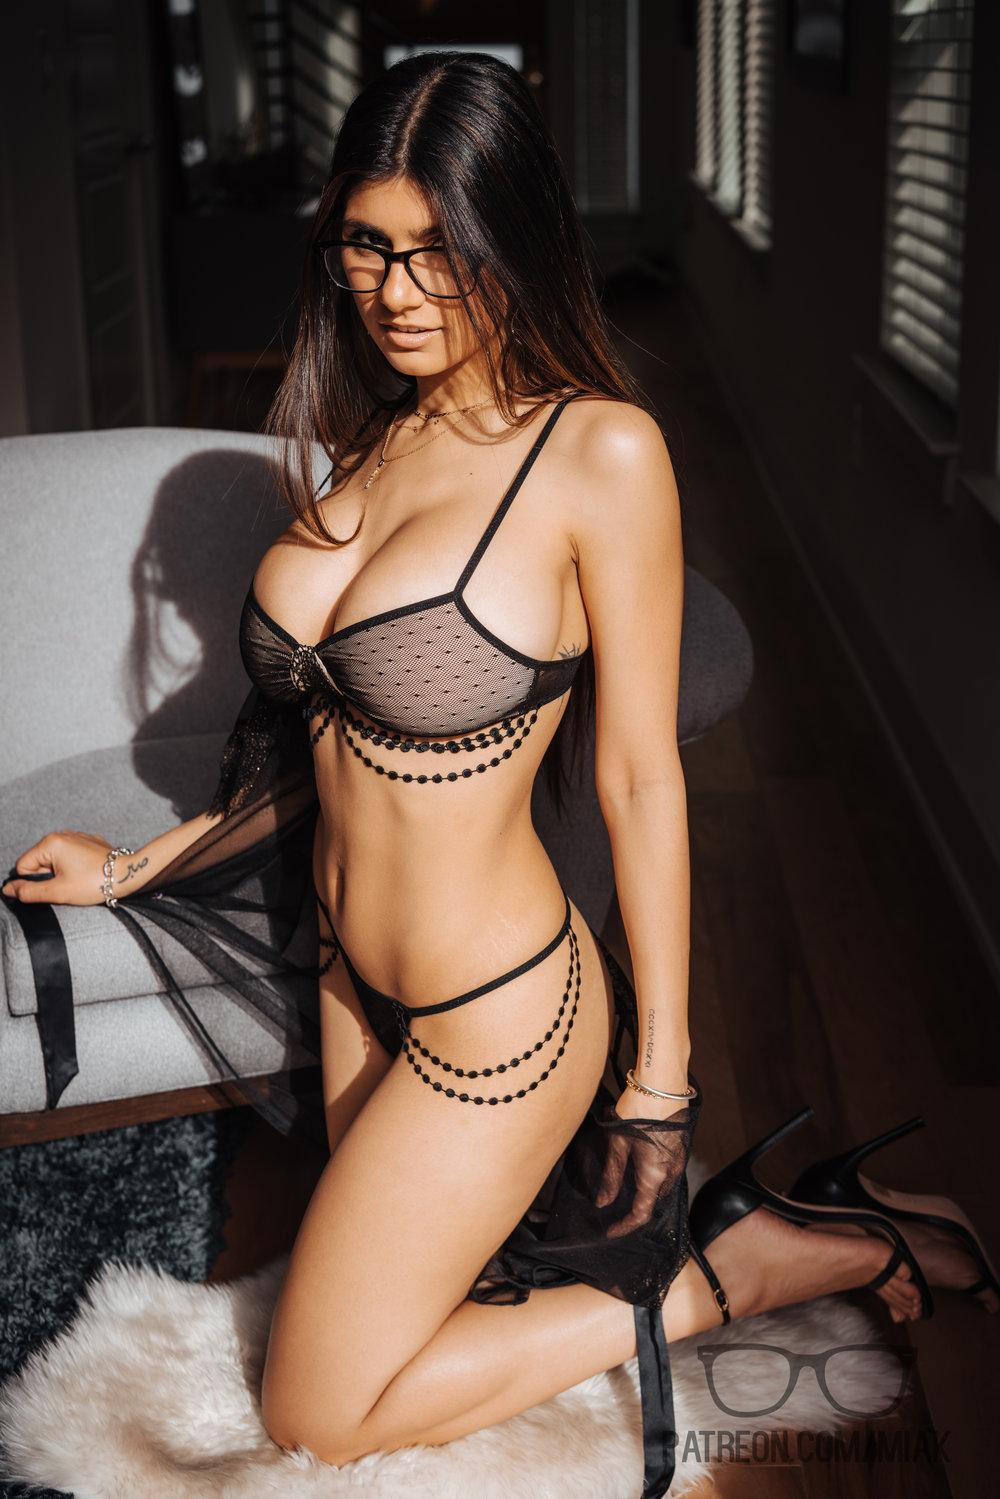 Mia Khalifa Lingerie Stiletto Heels Photoshoot Leaked 0016